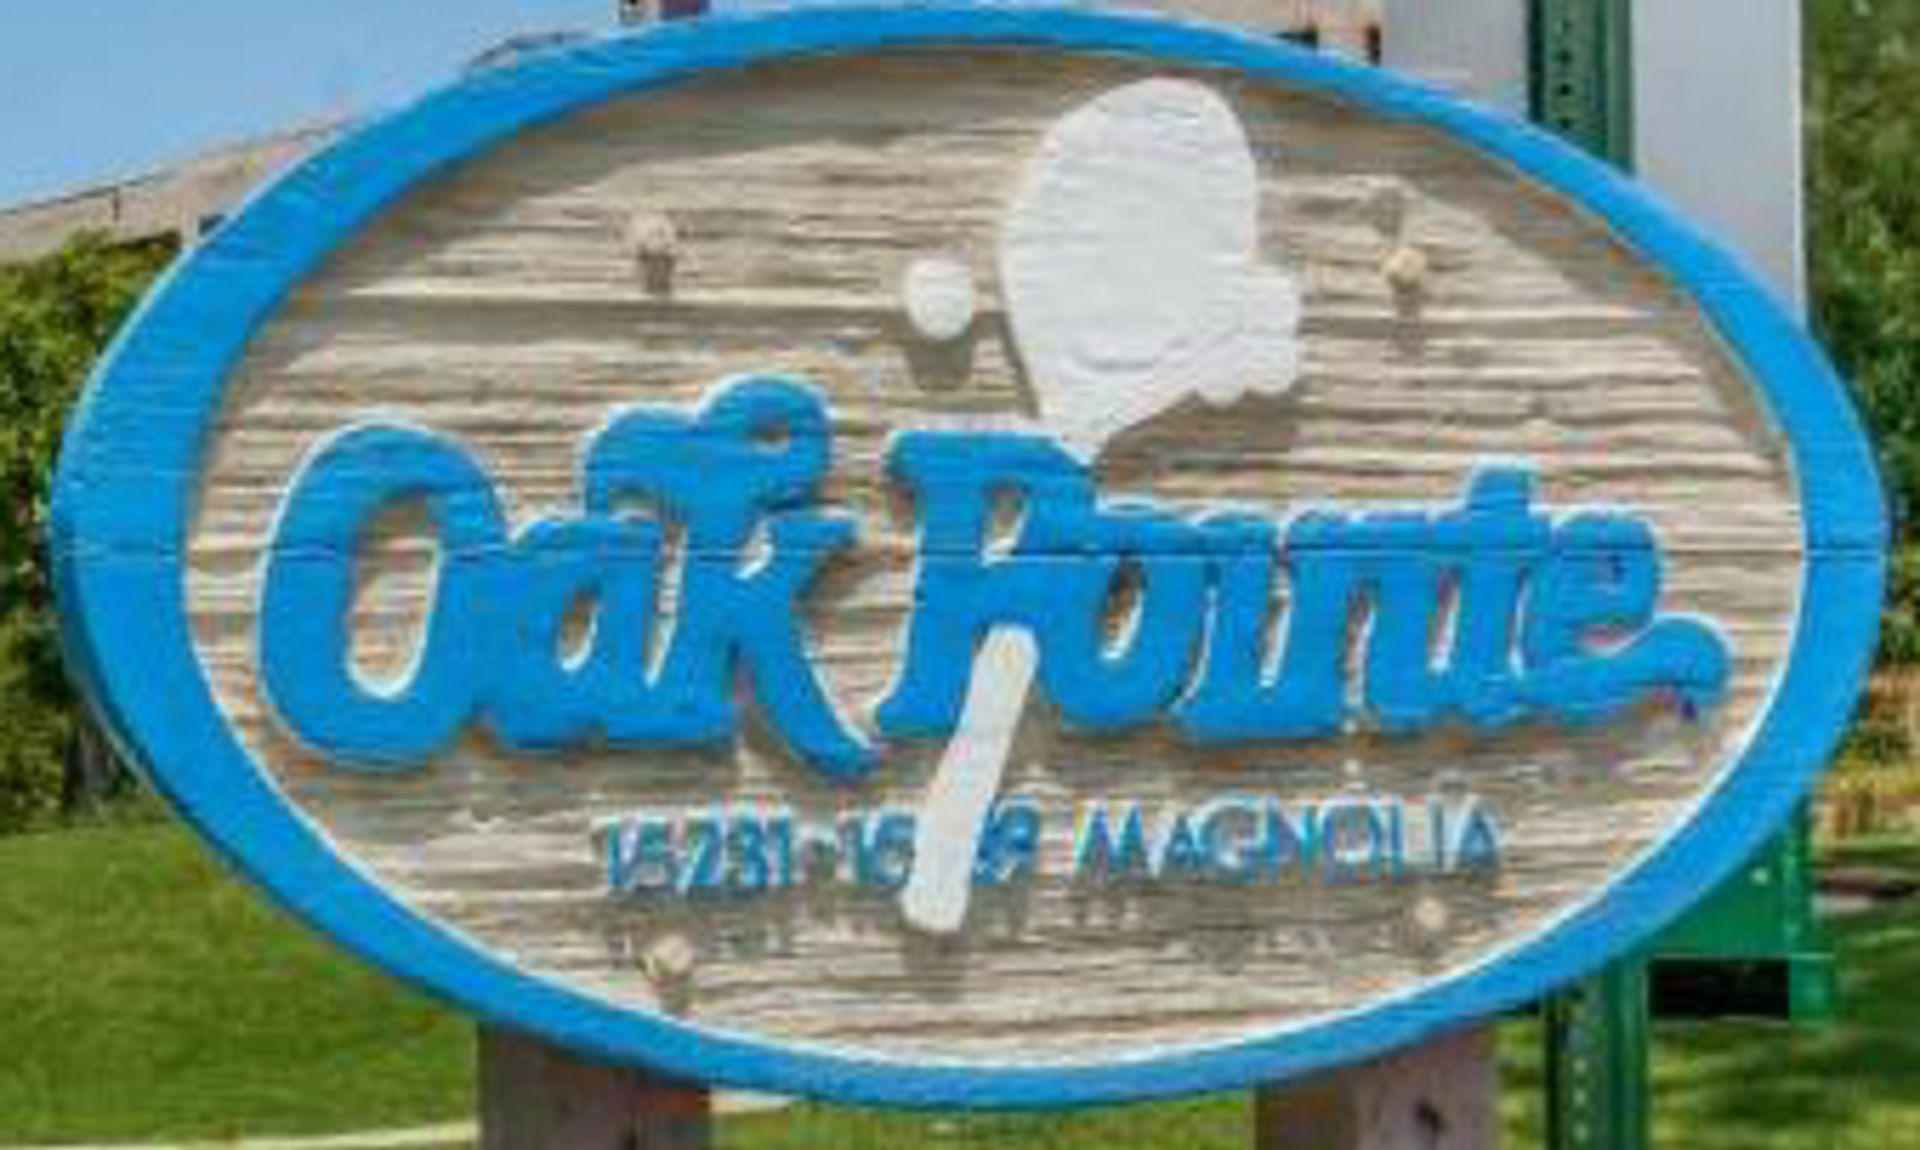 Oak Pointe Condos for Sale